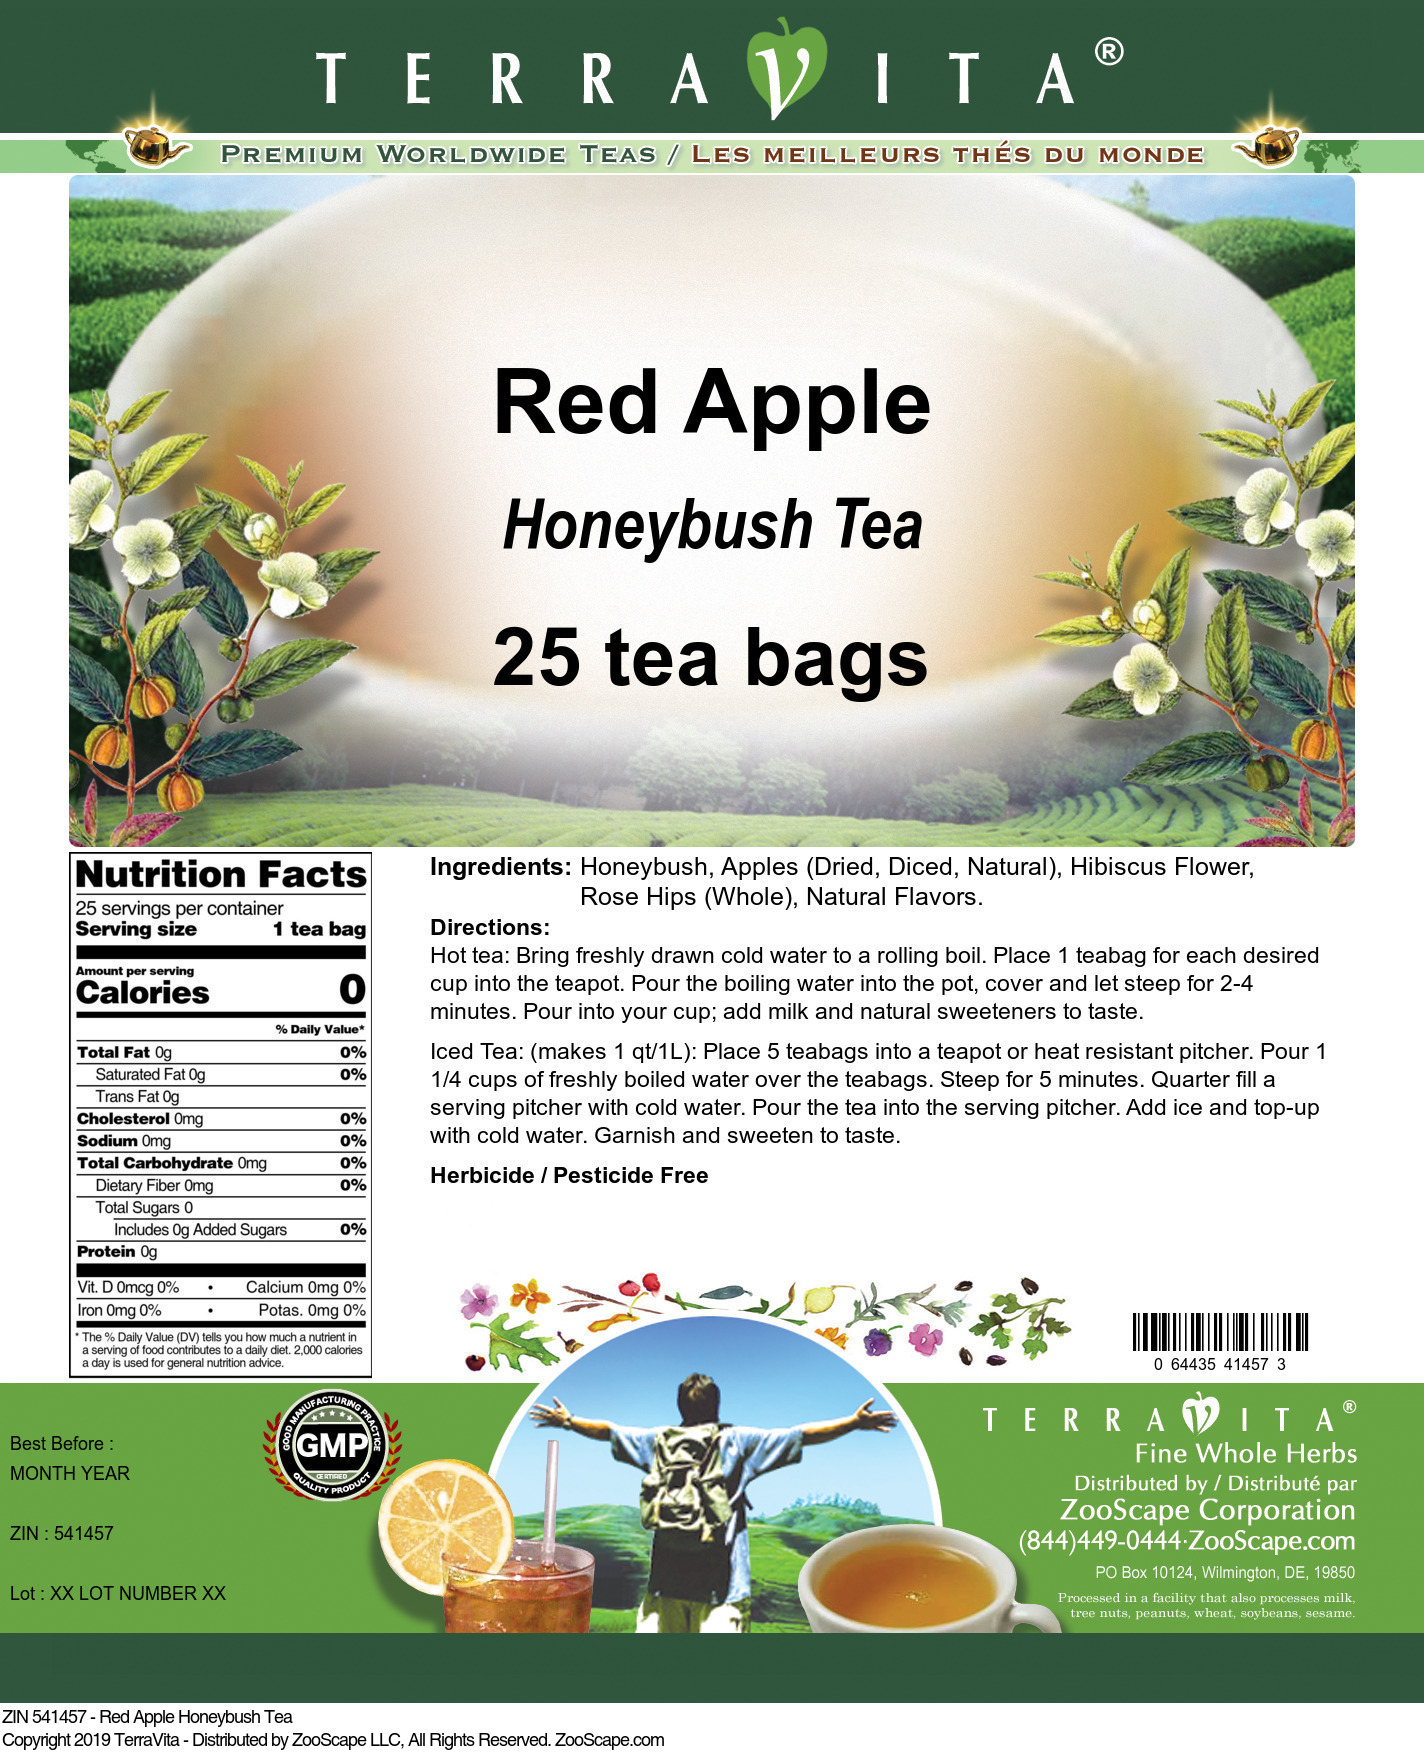 Red Apple Honeybush Tea